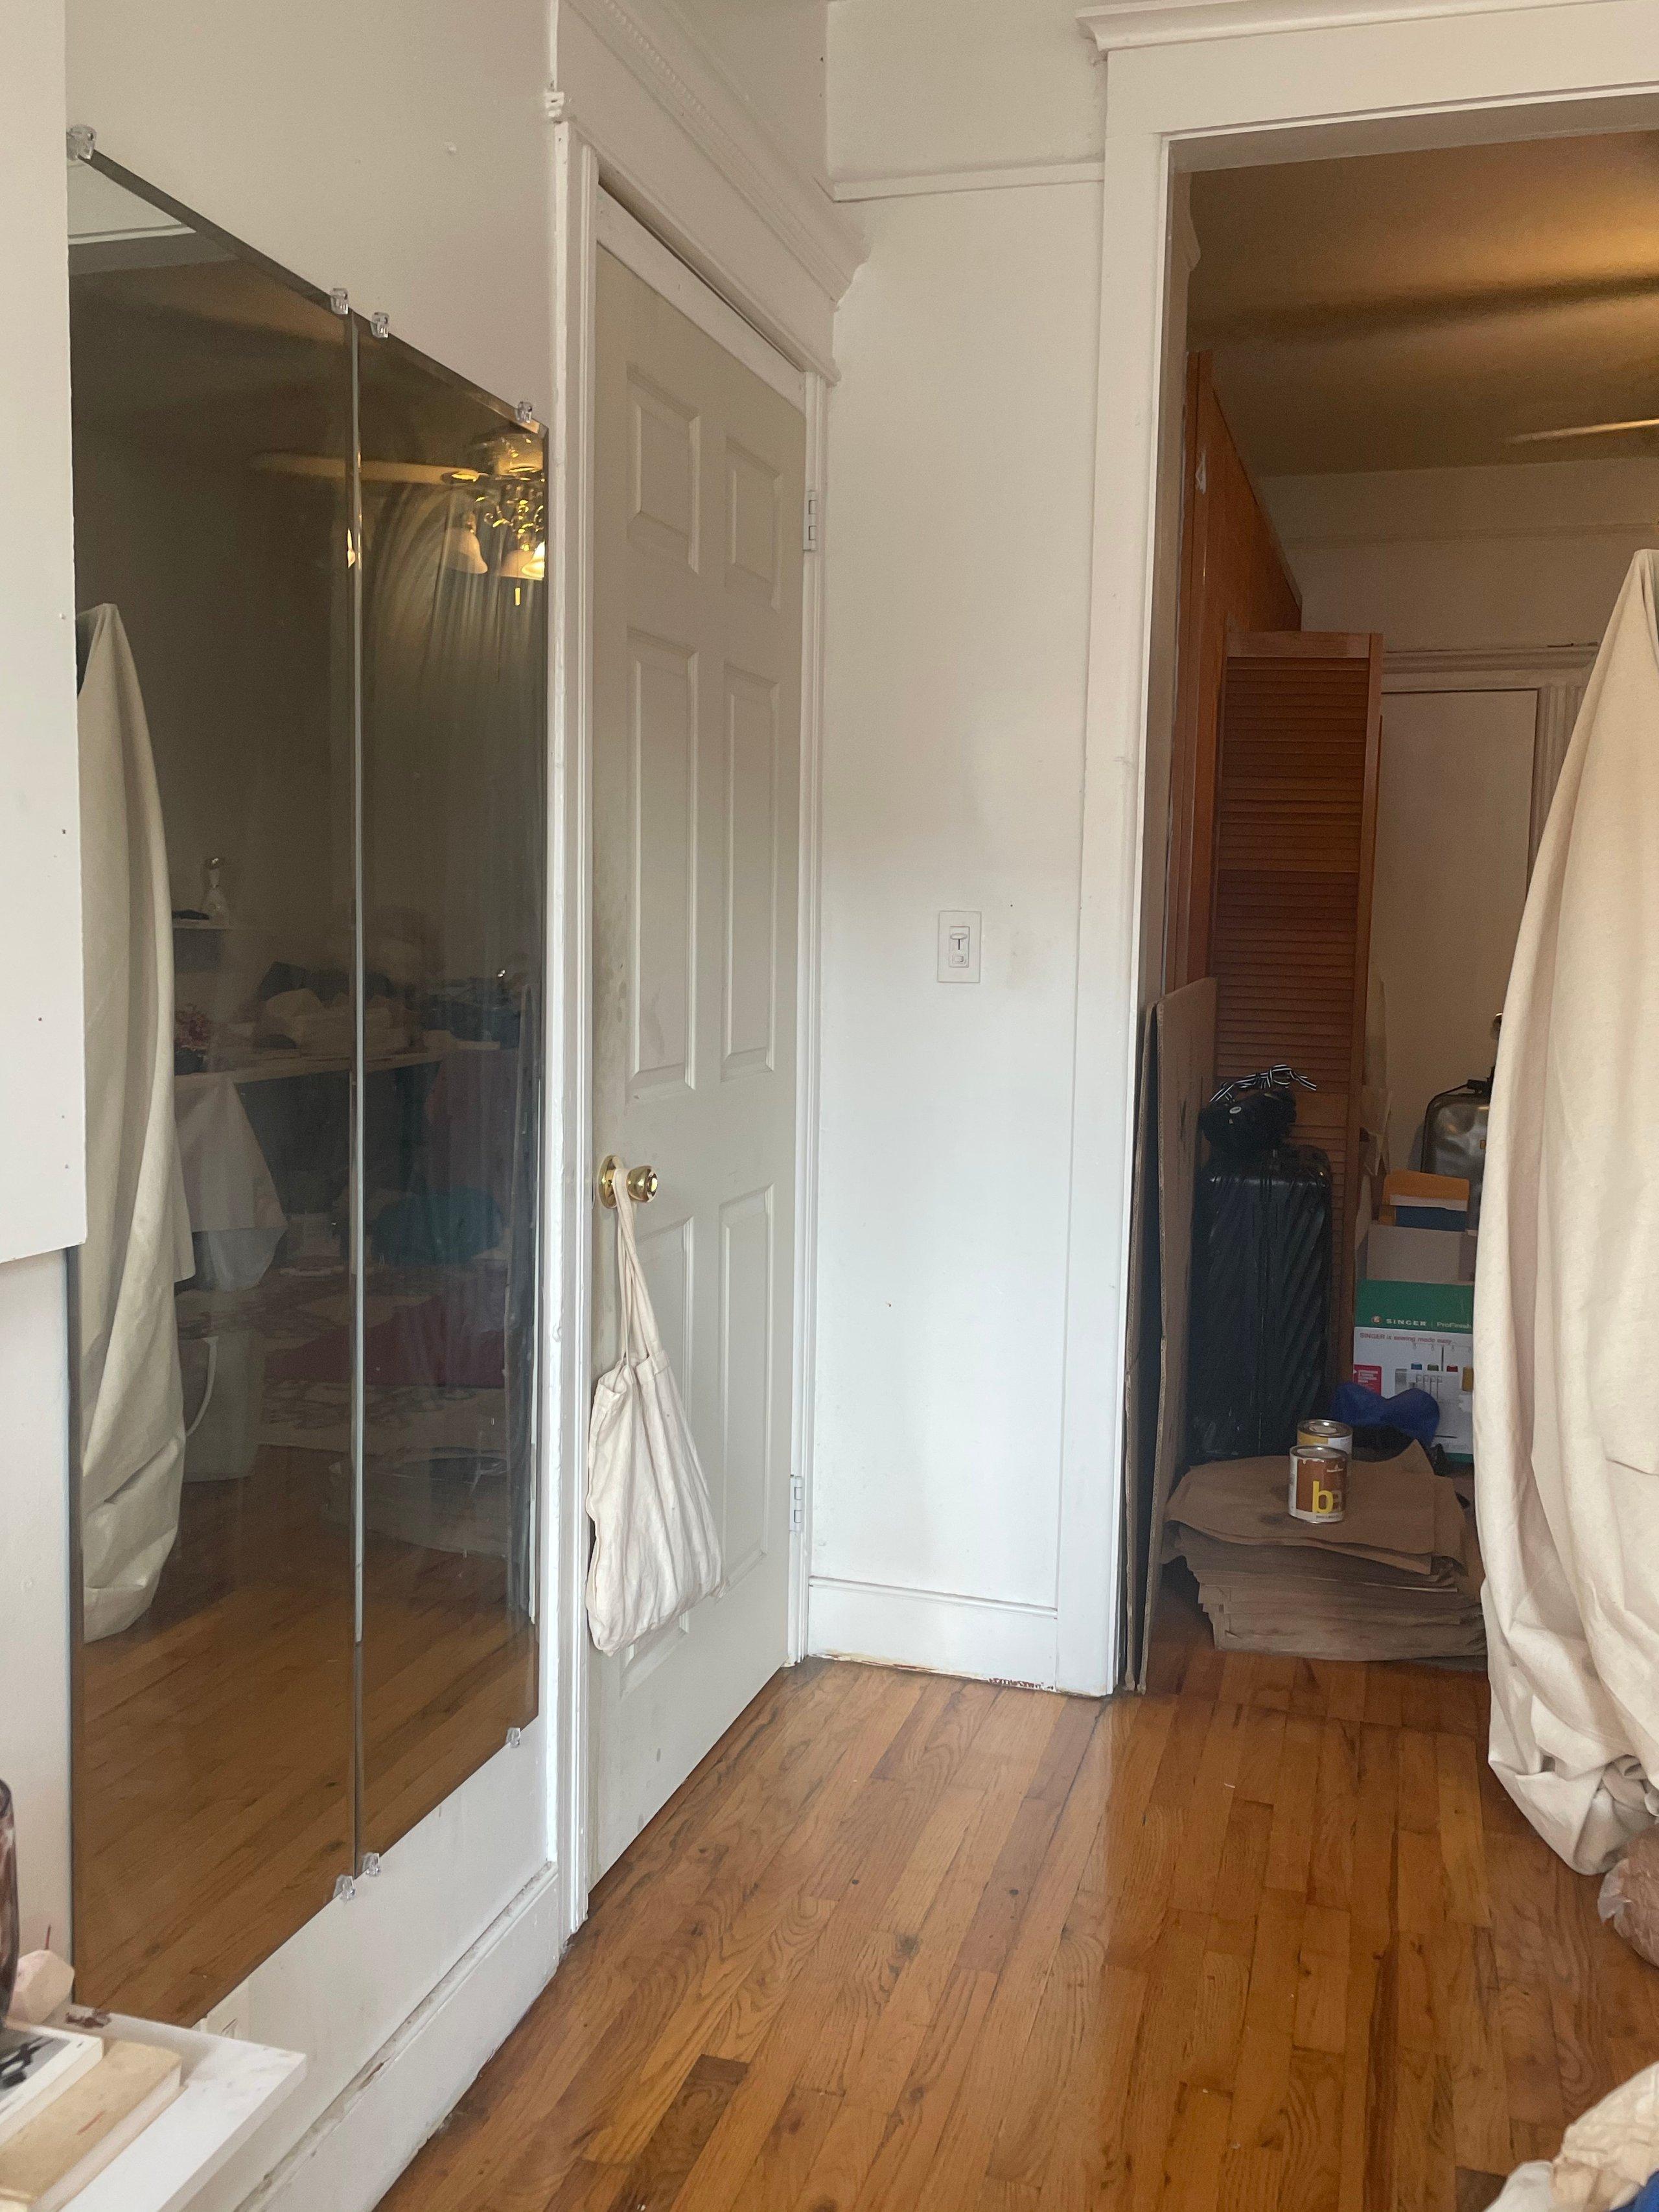 15x12 Bedroom self storage unit